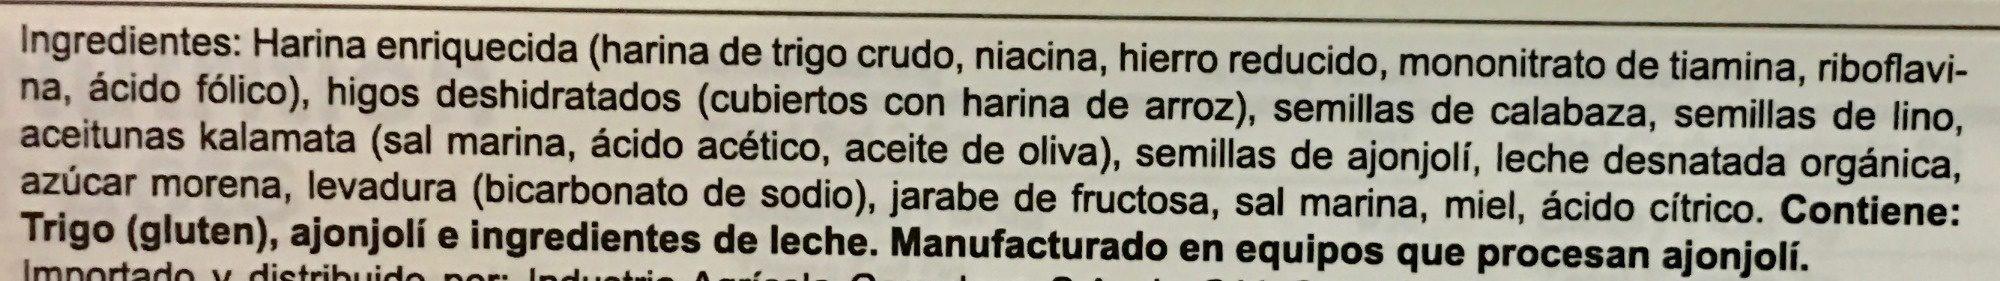 raincoast crips - Ingrédients - es